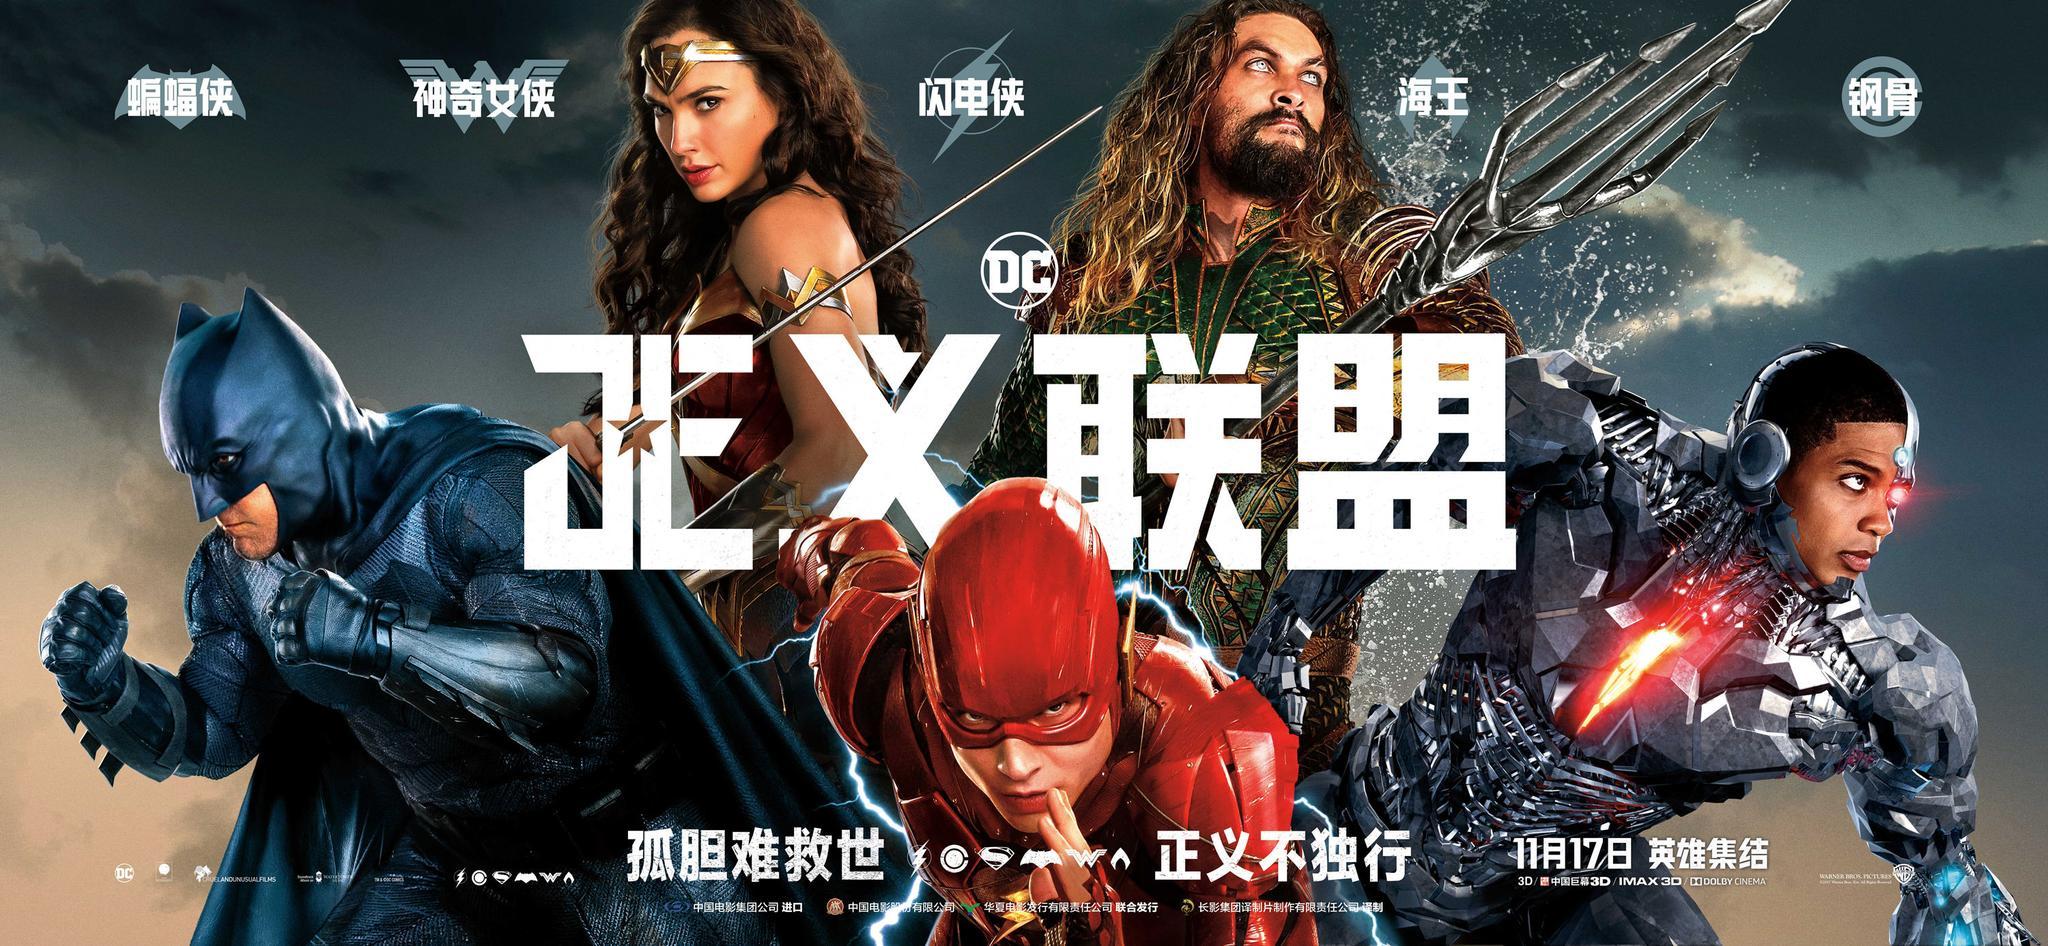 <br/>  《正义联盟》是DC首部英雄联盟电影,DC旗下最强超级英雄蝙蝠侠(Batman)、神奇女侠(Wonder Woman)、超人(Superman)、闪电侠(The Flash)、海王(Aquaman)、钢骨(Cyborg)首度合体,宇宙级大反派荒原狼(Steppenwolf)强势挑战。